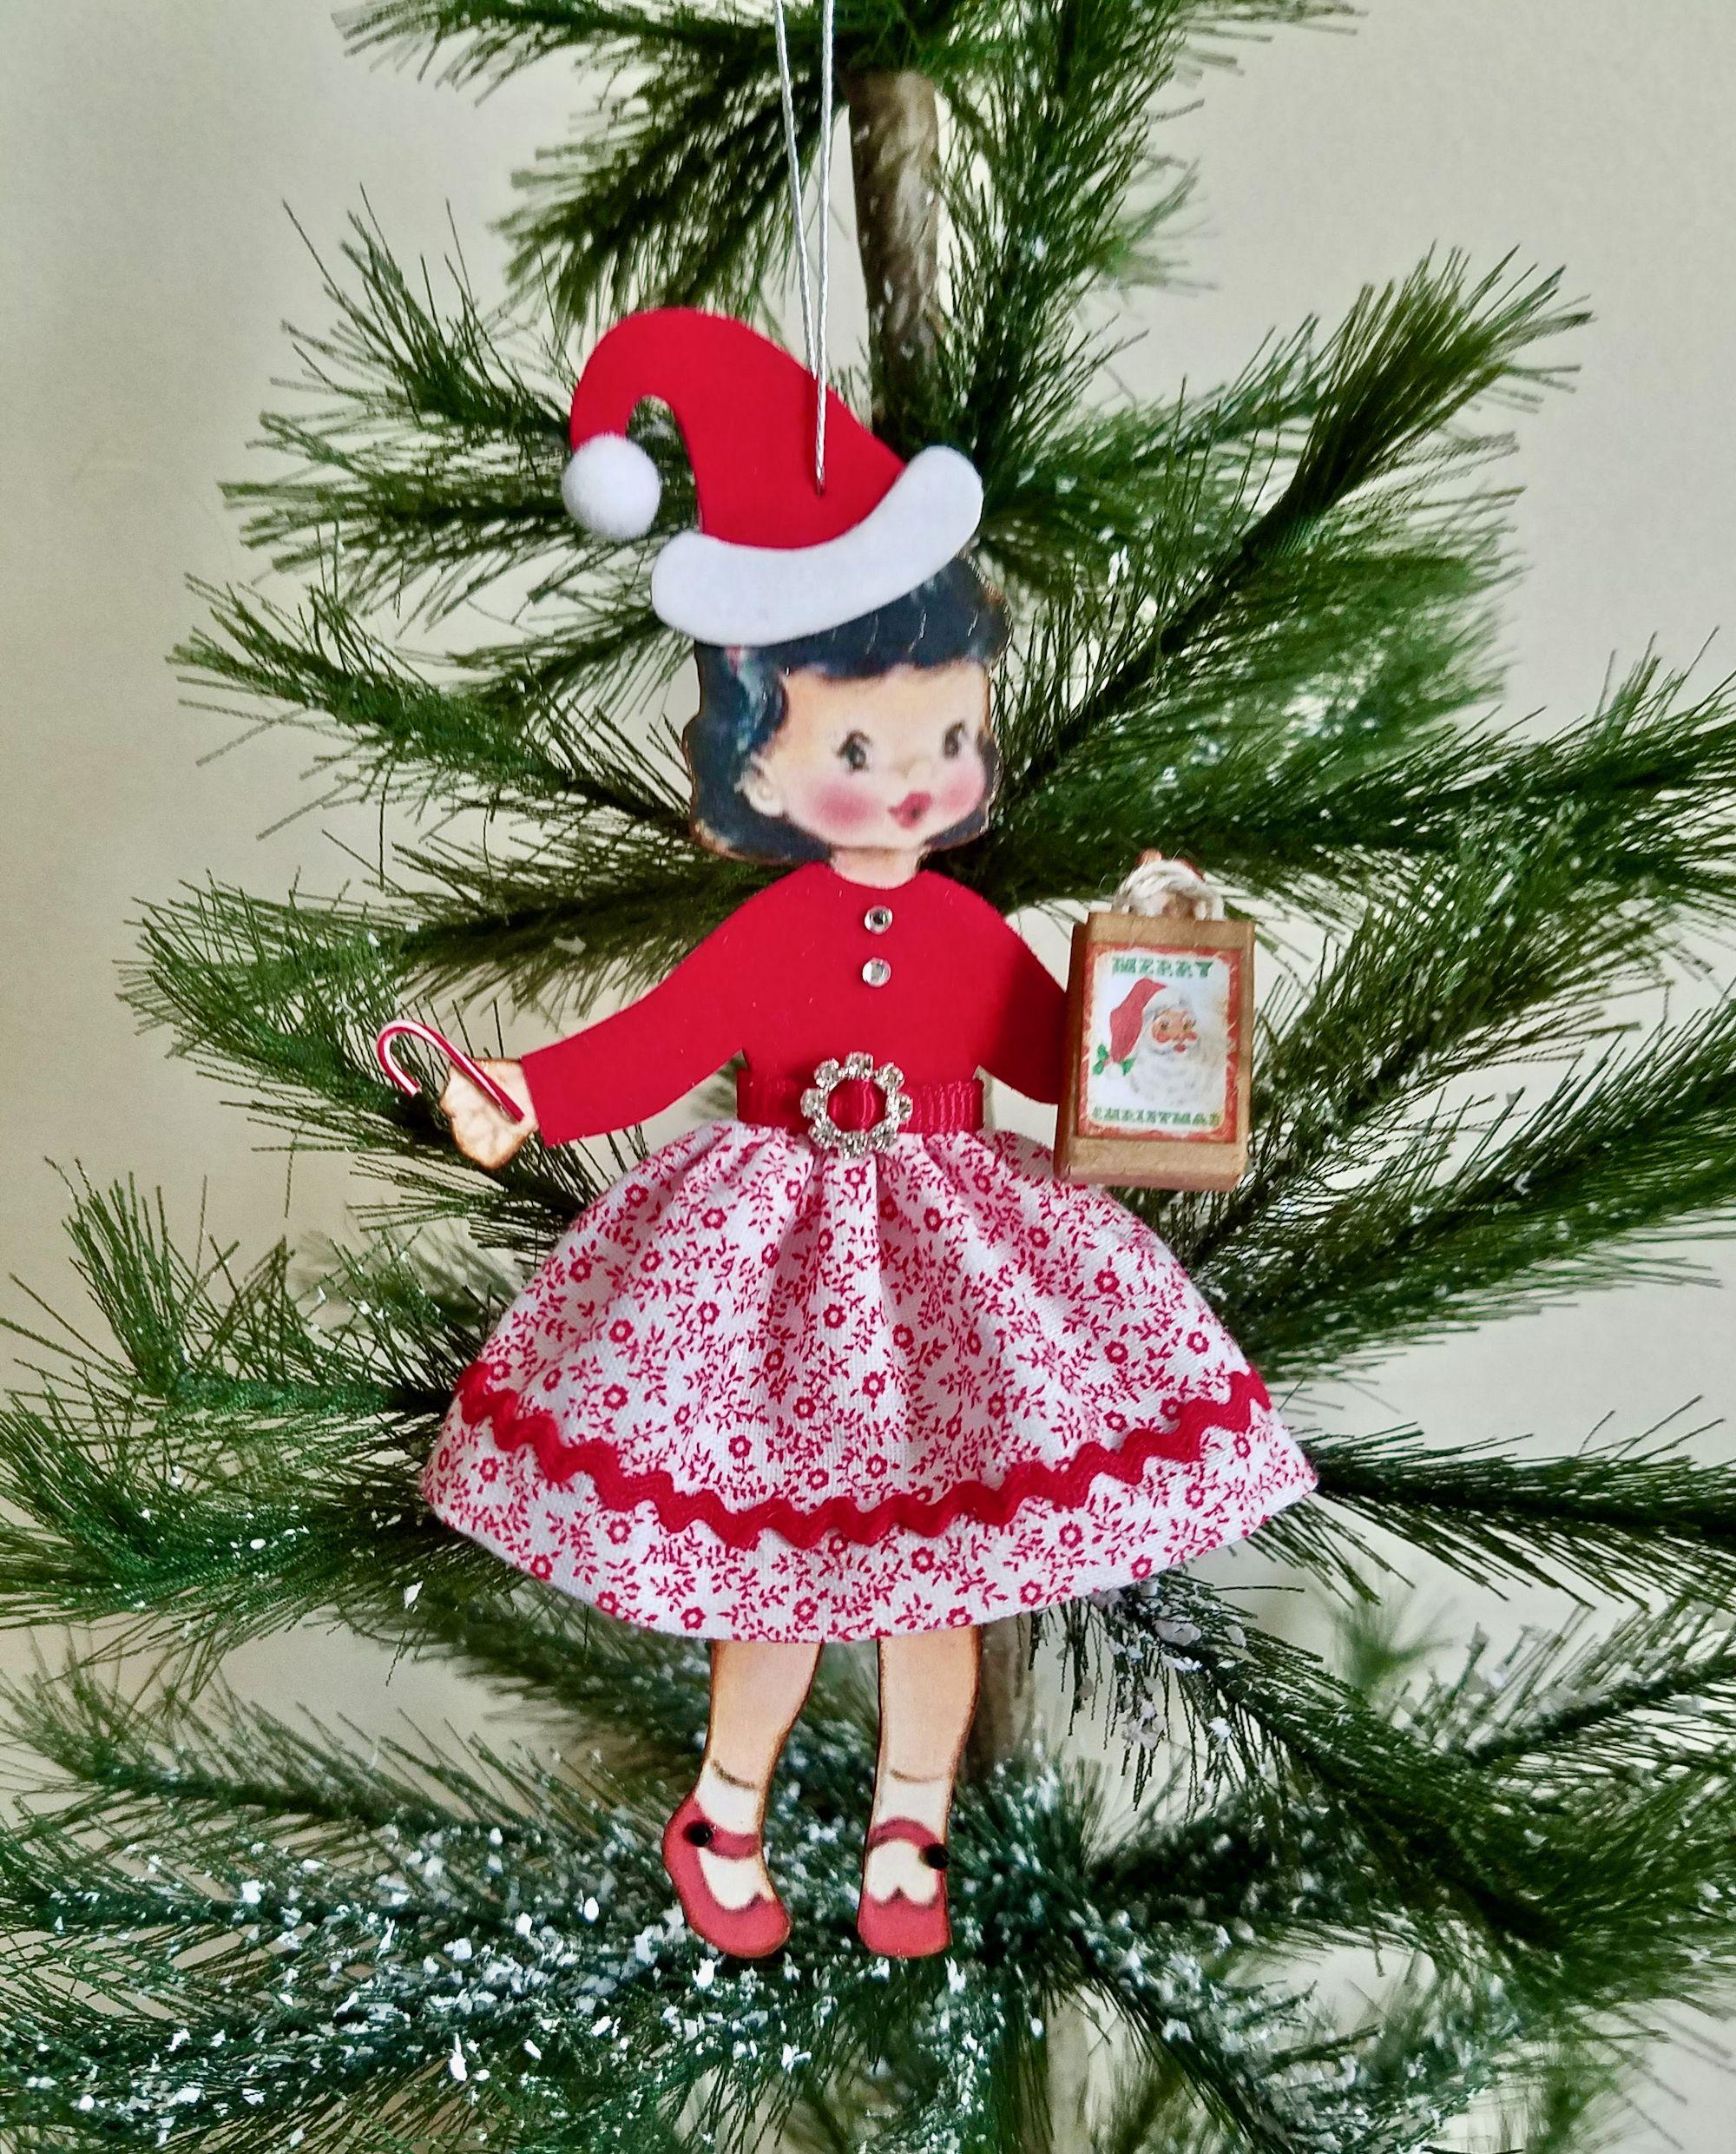 Handmade retro '50's paper doll ornament wearing a Santa